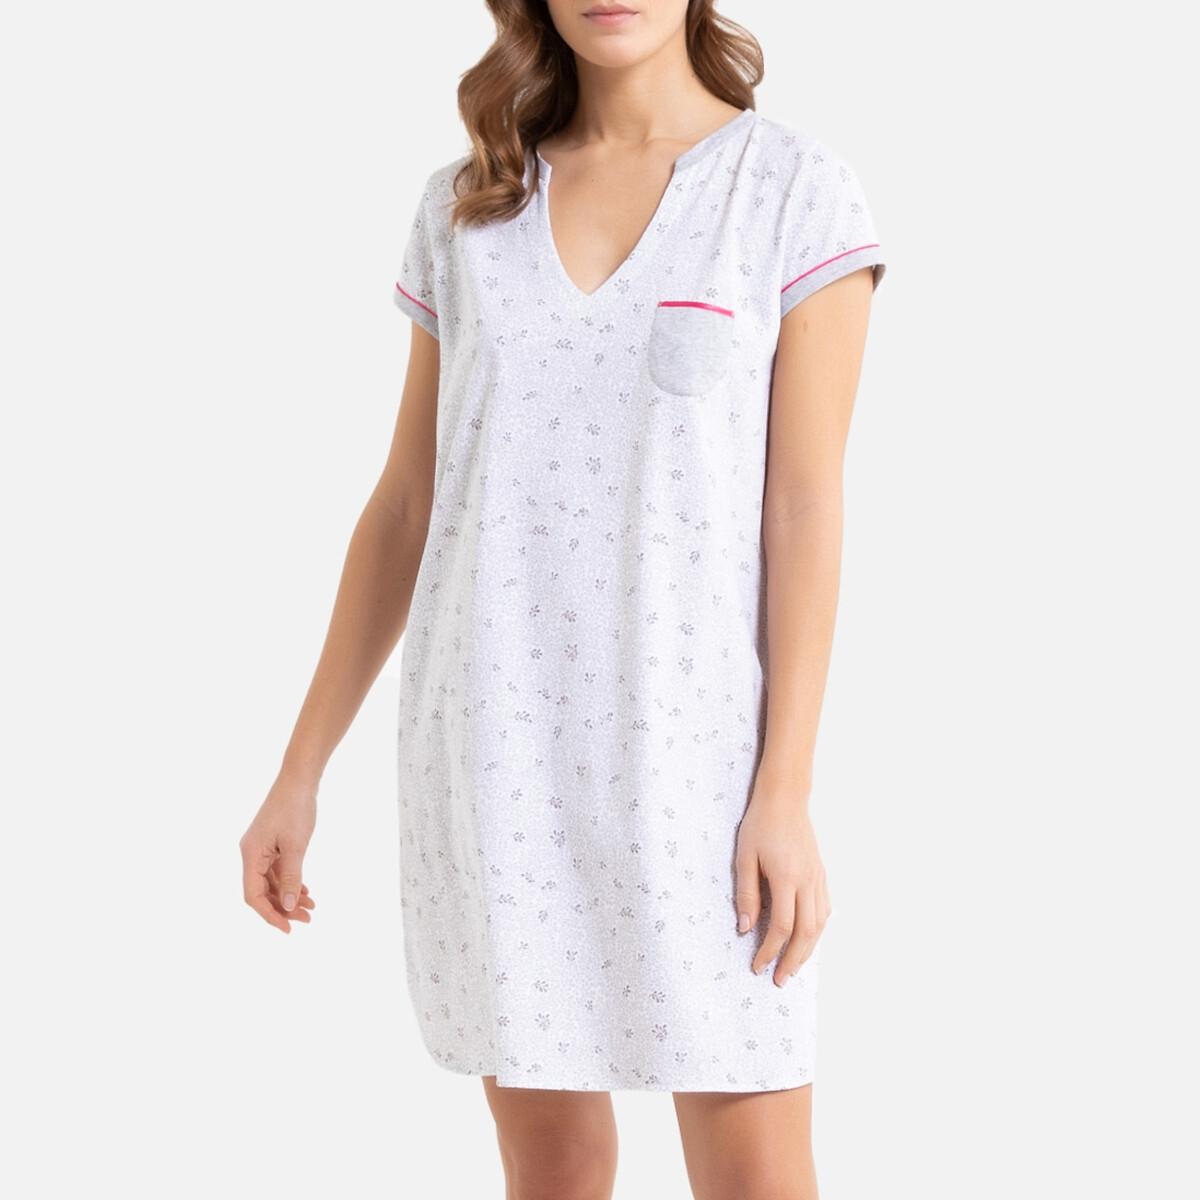 Рубашка La Redoute Ночная из хлопка Bourgeon 44 (FR) - 50 (RUS) белый комплект из полотенце для la redoute рук из хлопка и льна nipaly 50 x 100 см белый